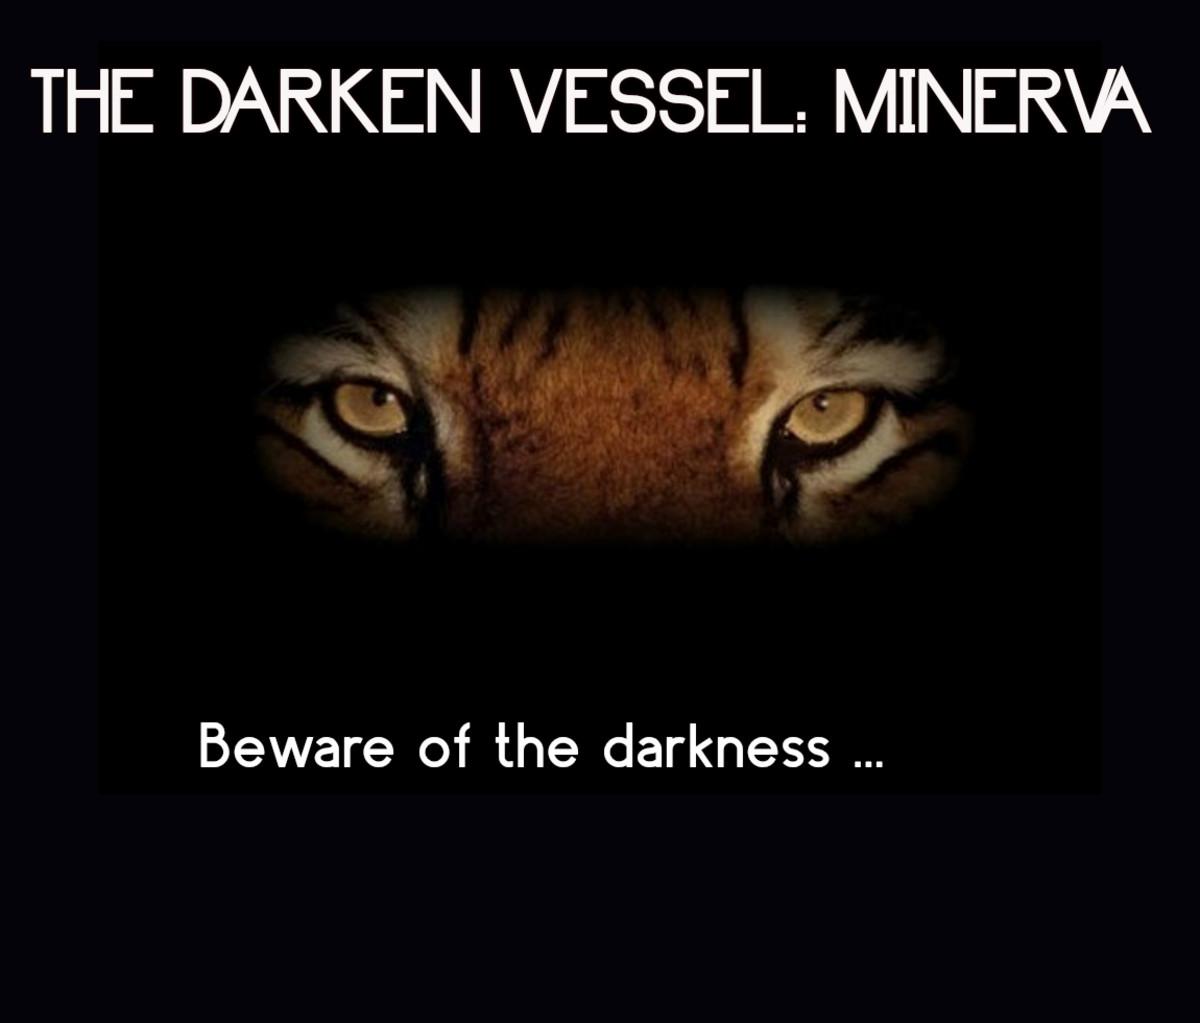 The Darken Vessel: Minerva 7